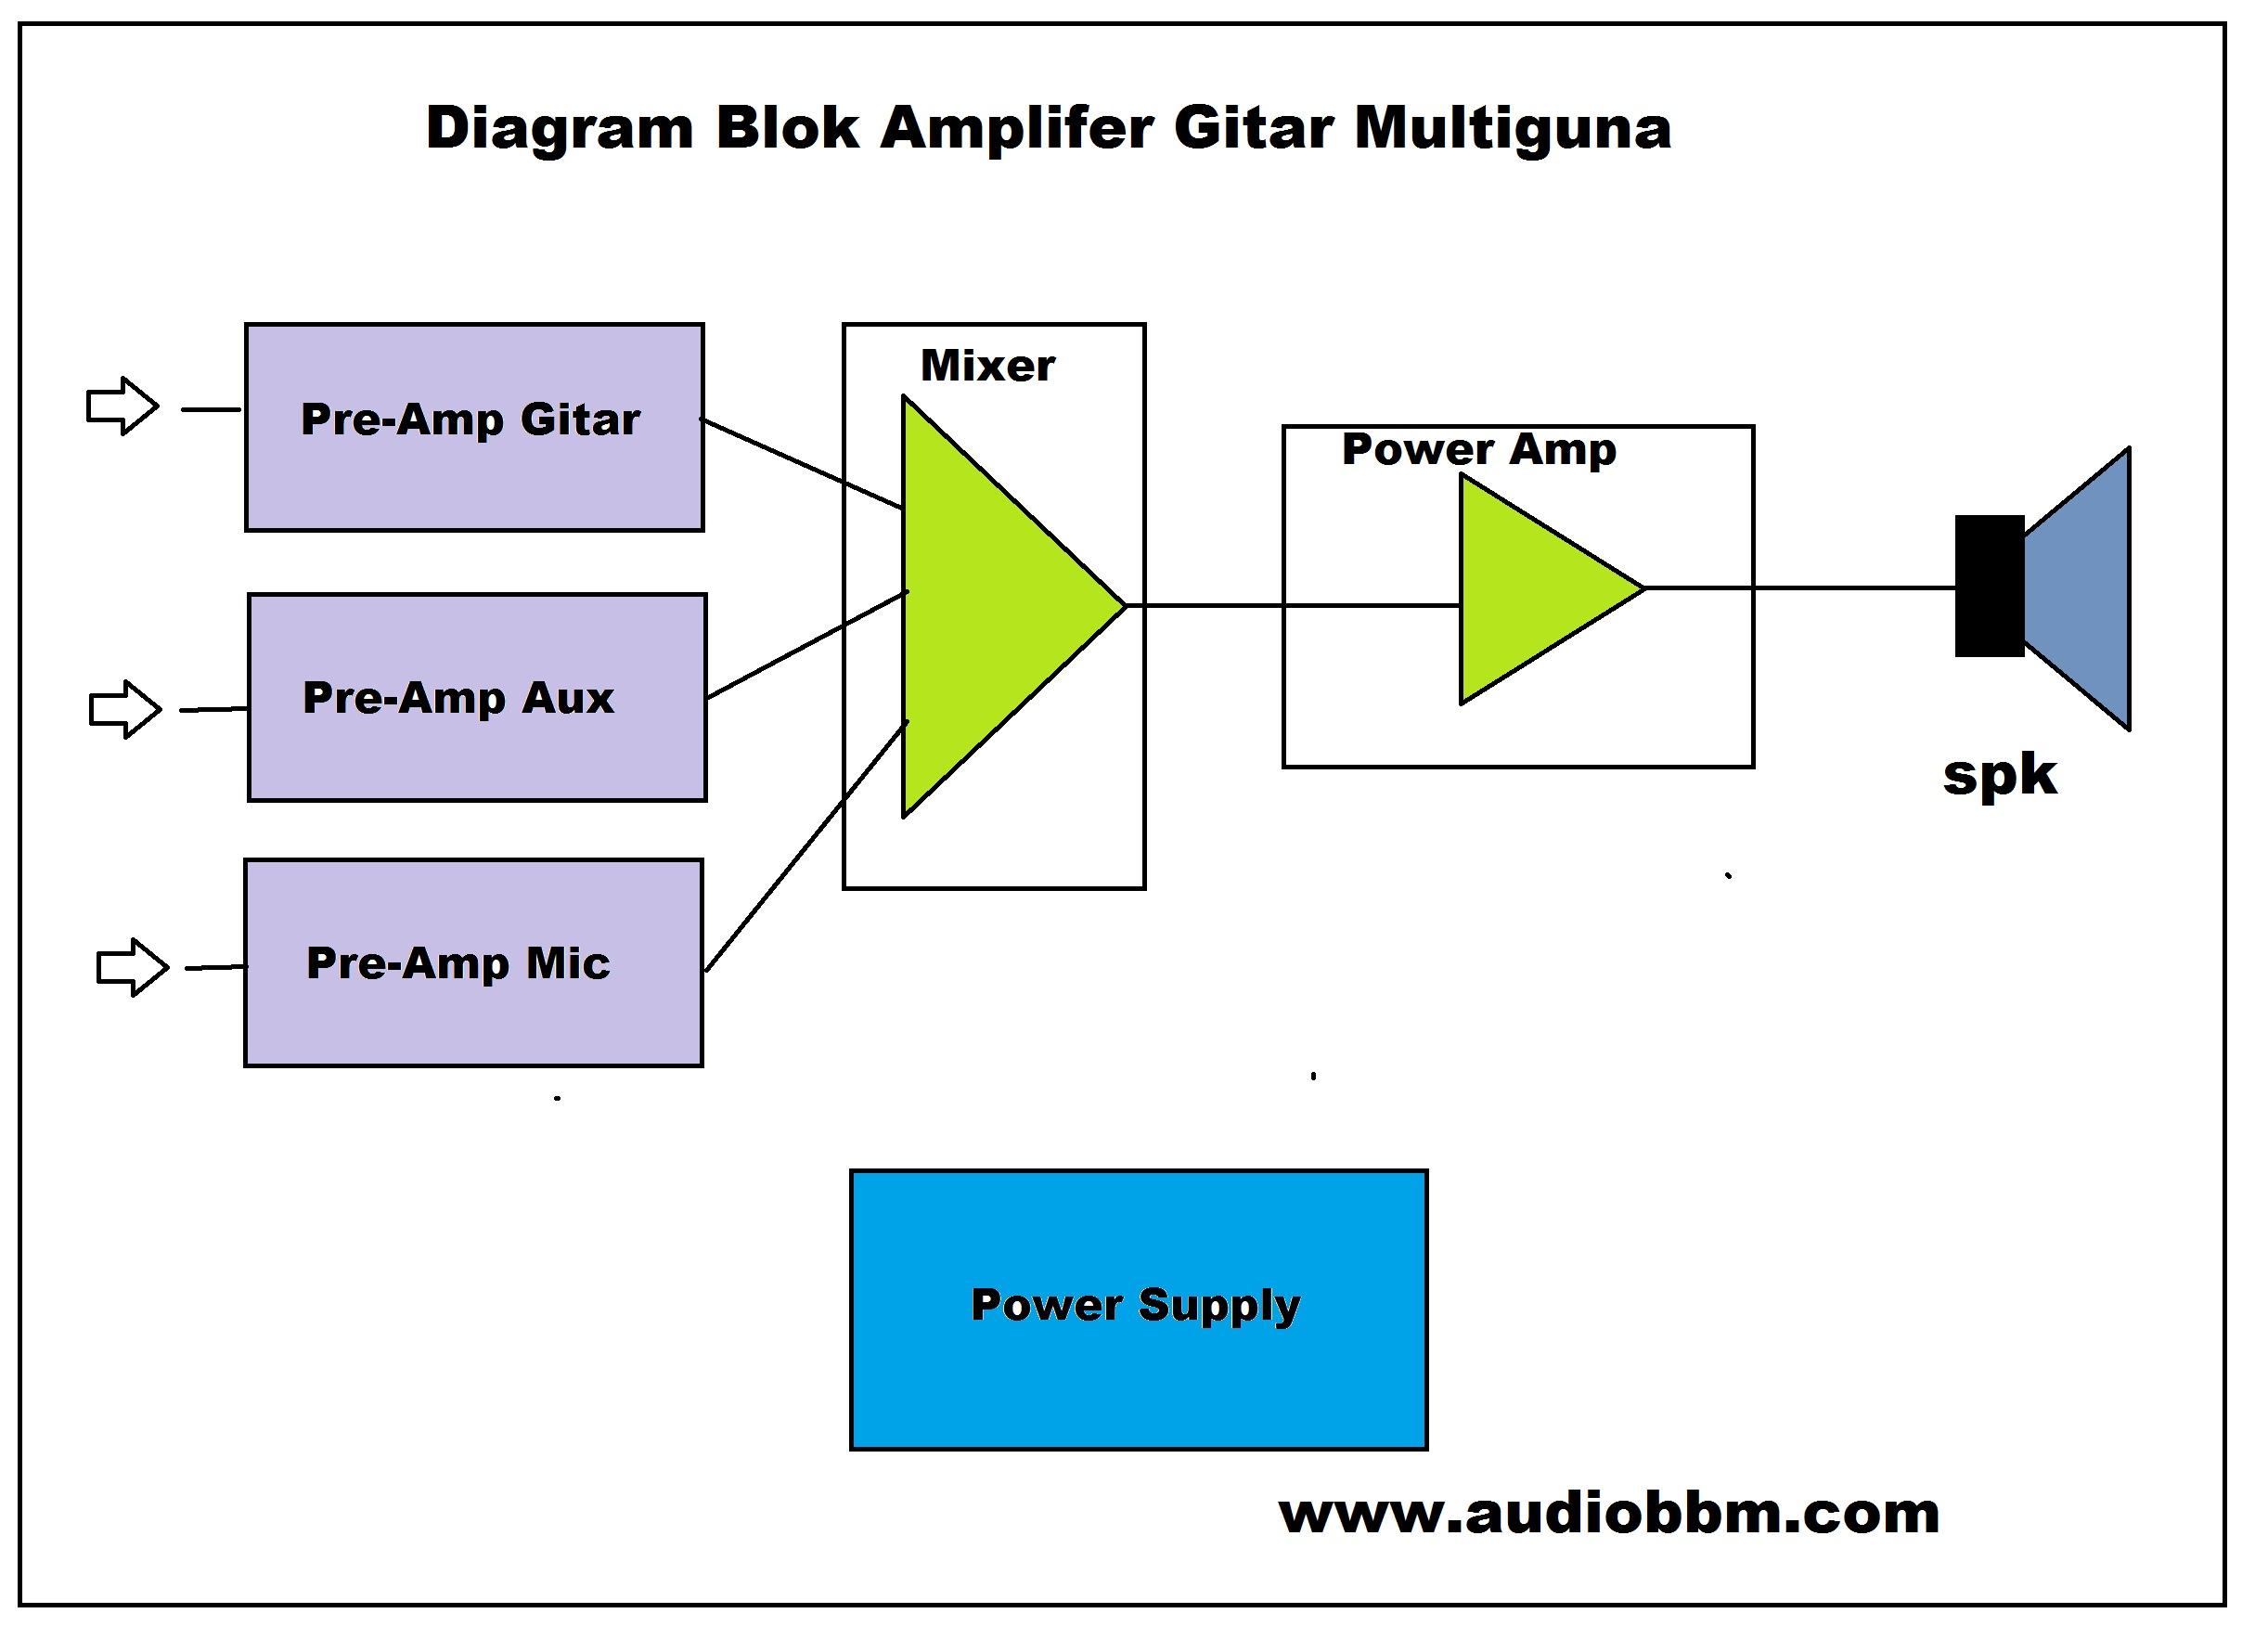 Audiobbm lets do it free information for hobbyist diy amplifier gitar multiguna ccuart Gallery